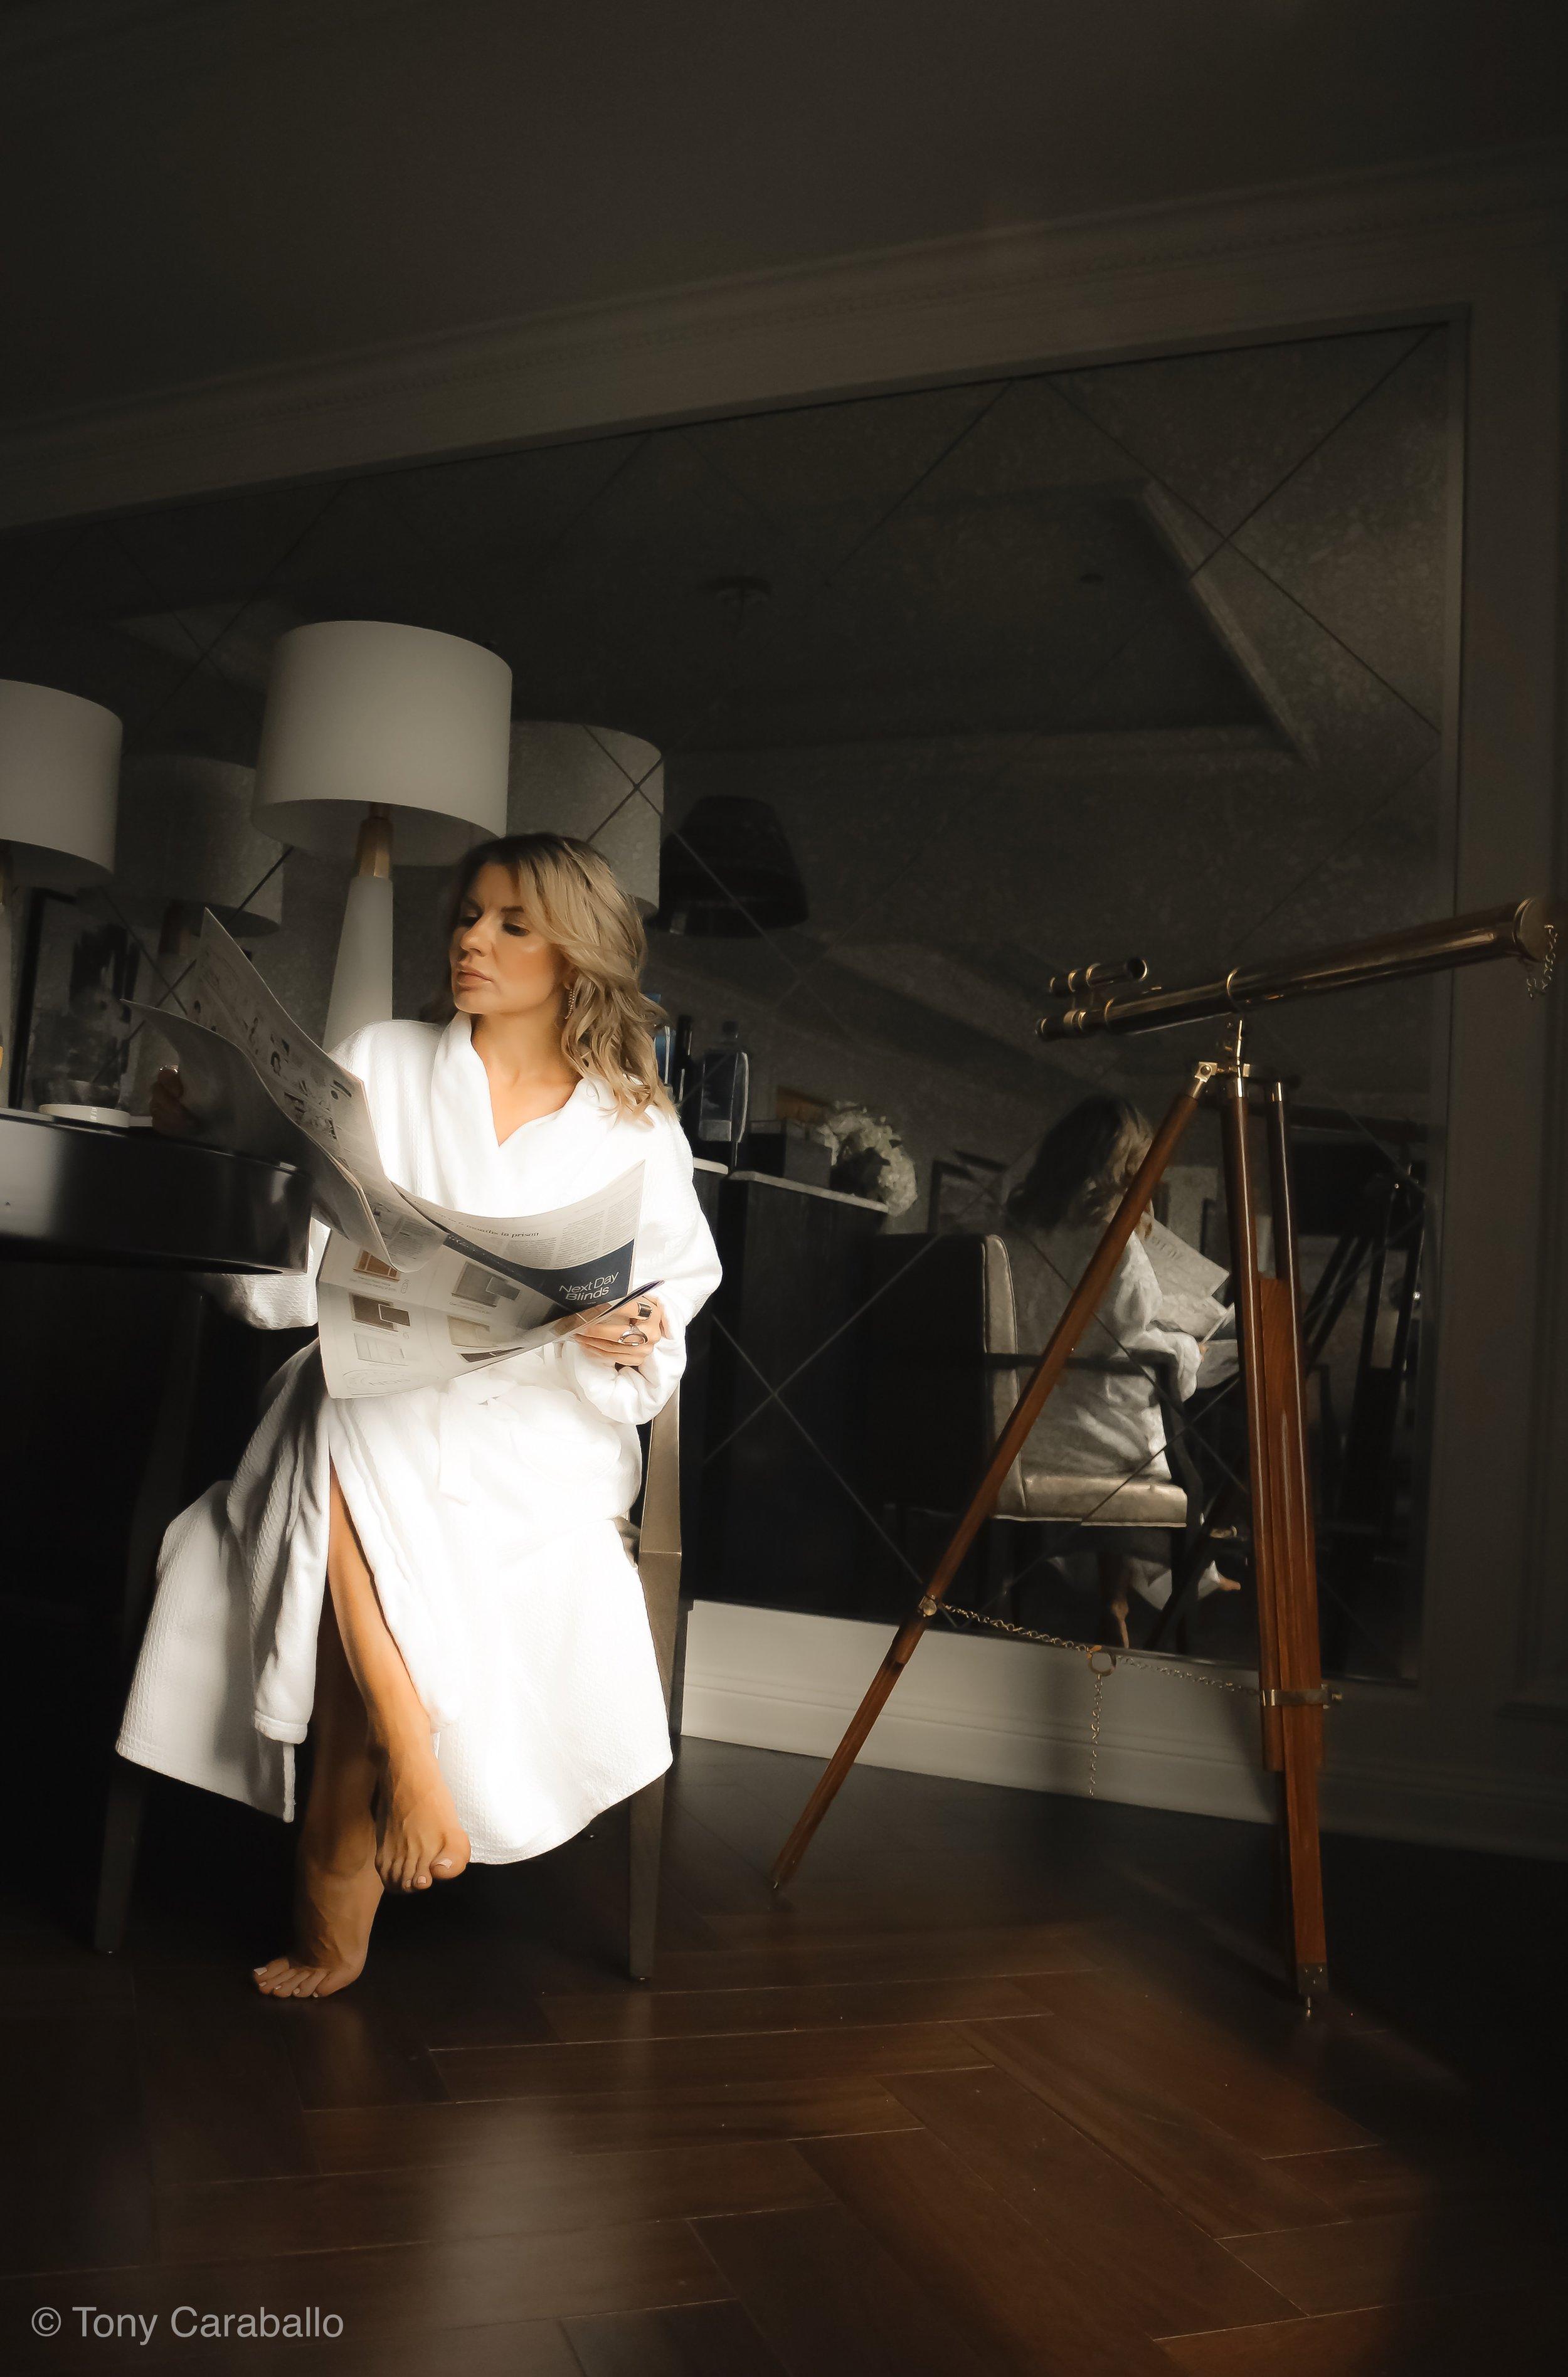 Ritz Carlton Presidential Suite Isabel Alexander reading morning newspaper